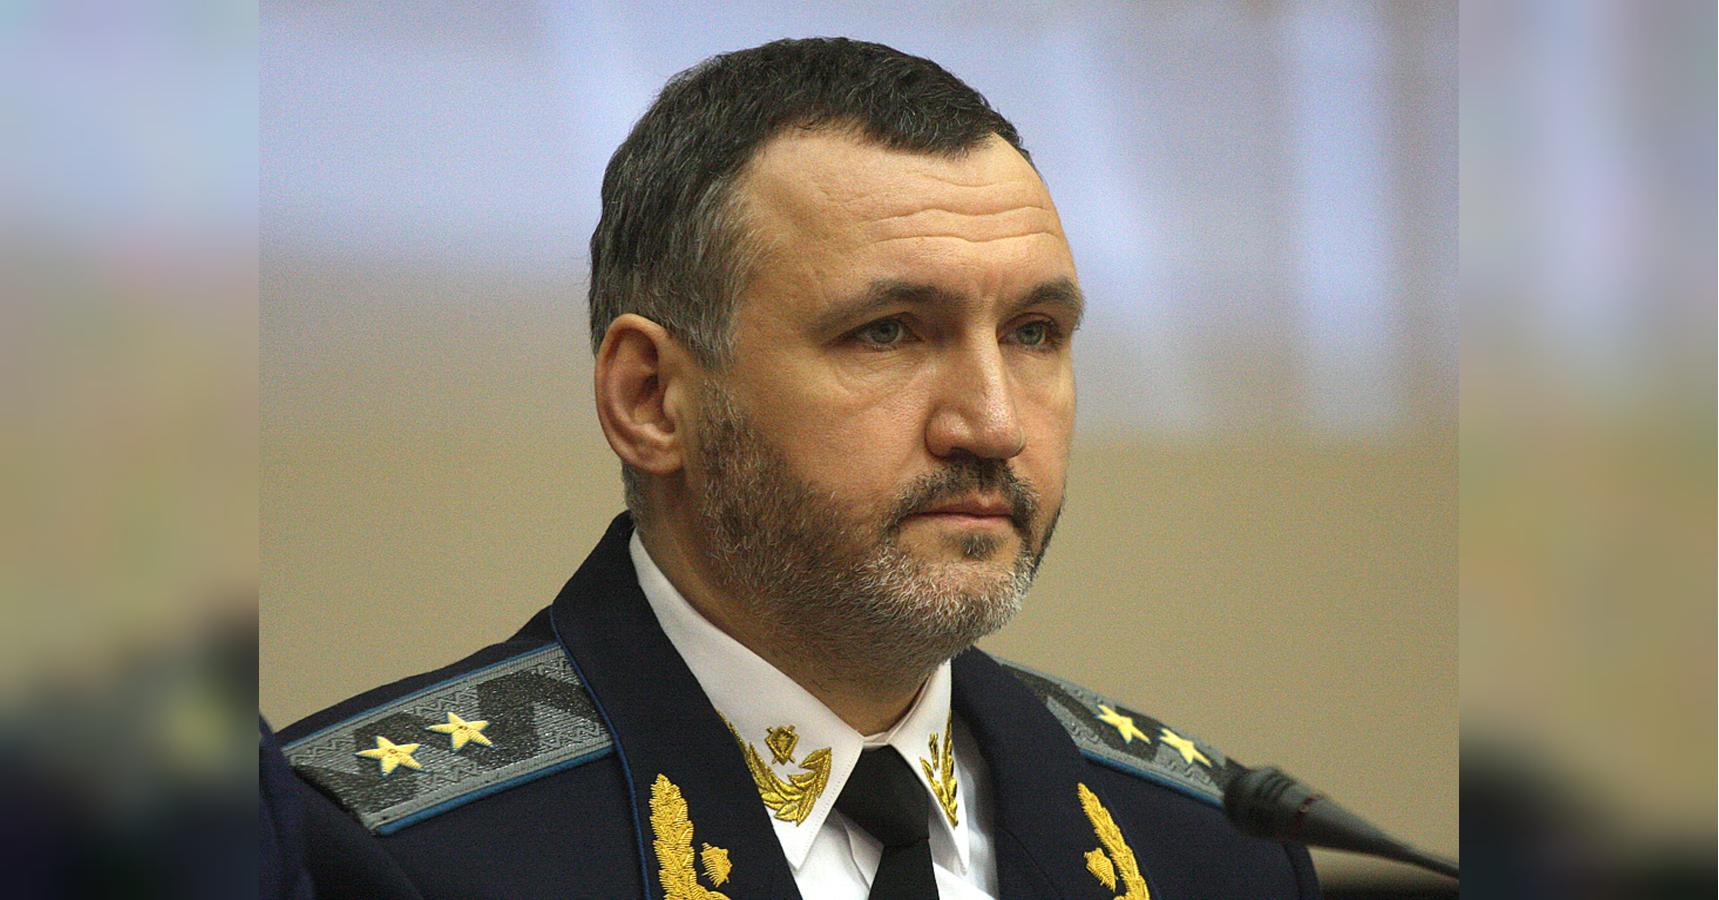 https://fakty.ua/photos2/article/31/17/311725_fb_082804.jpg